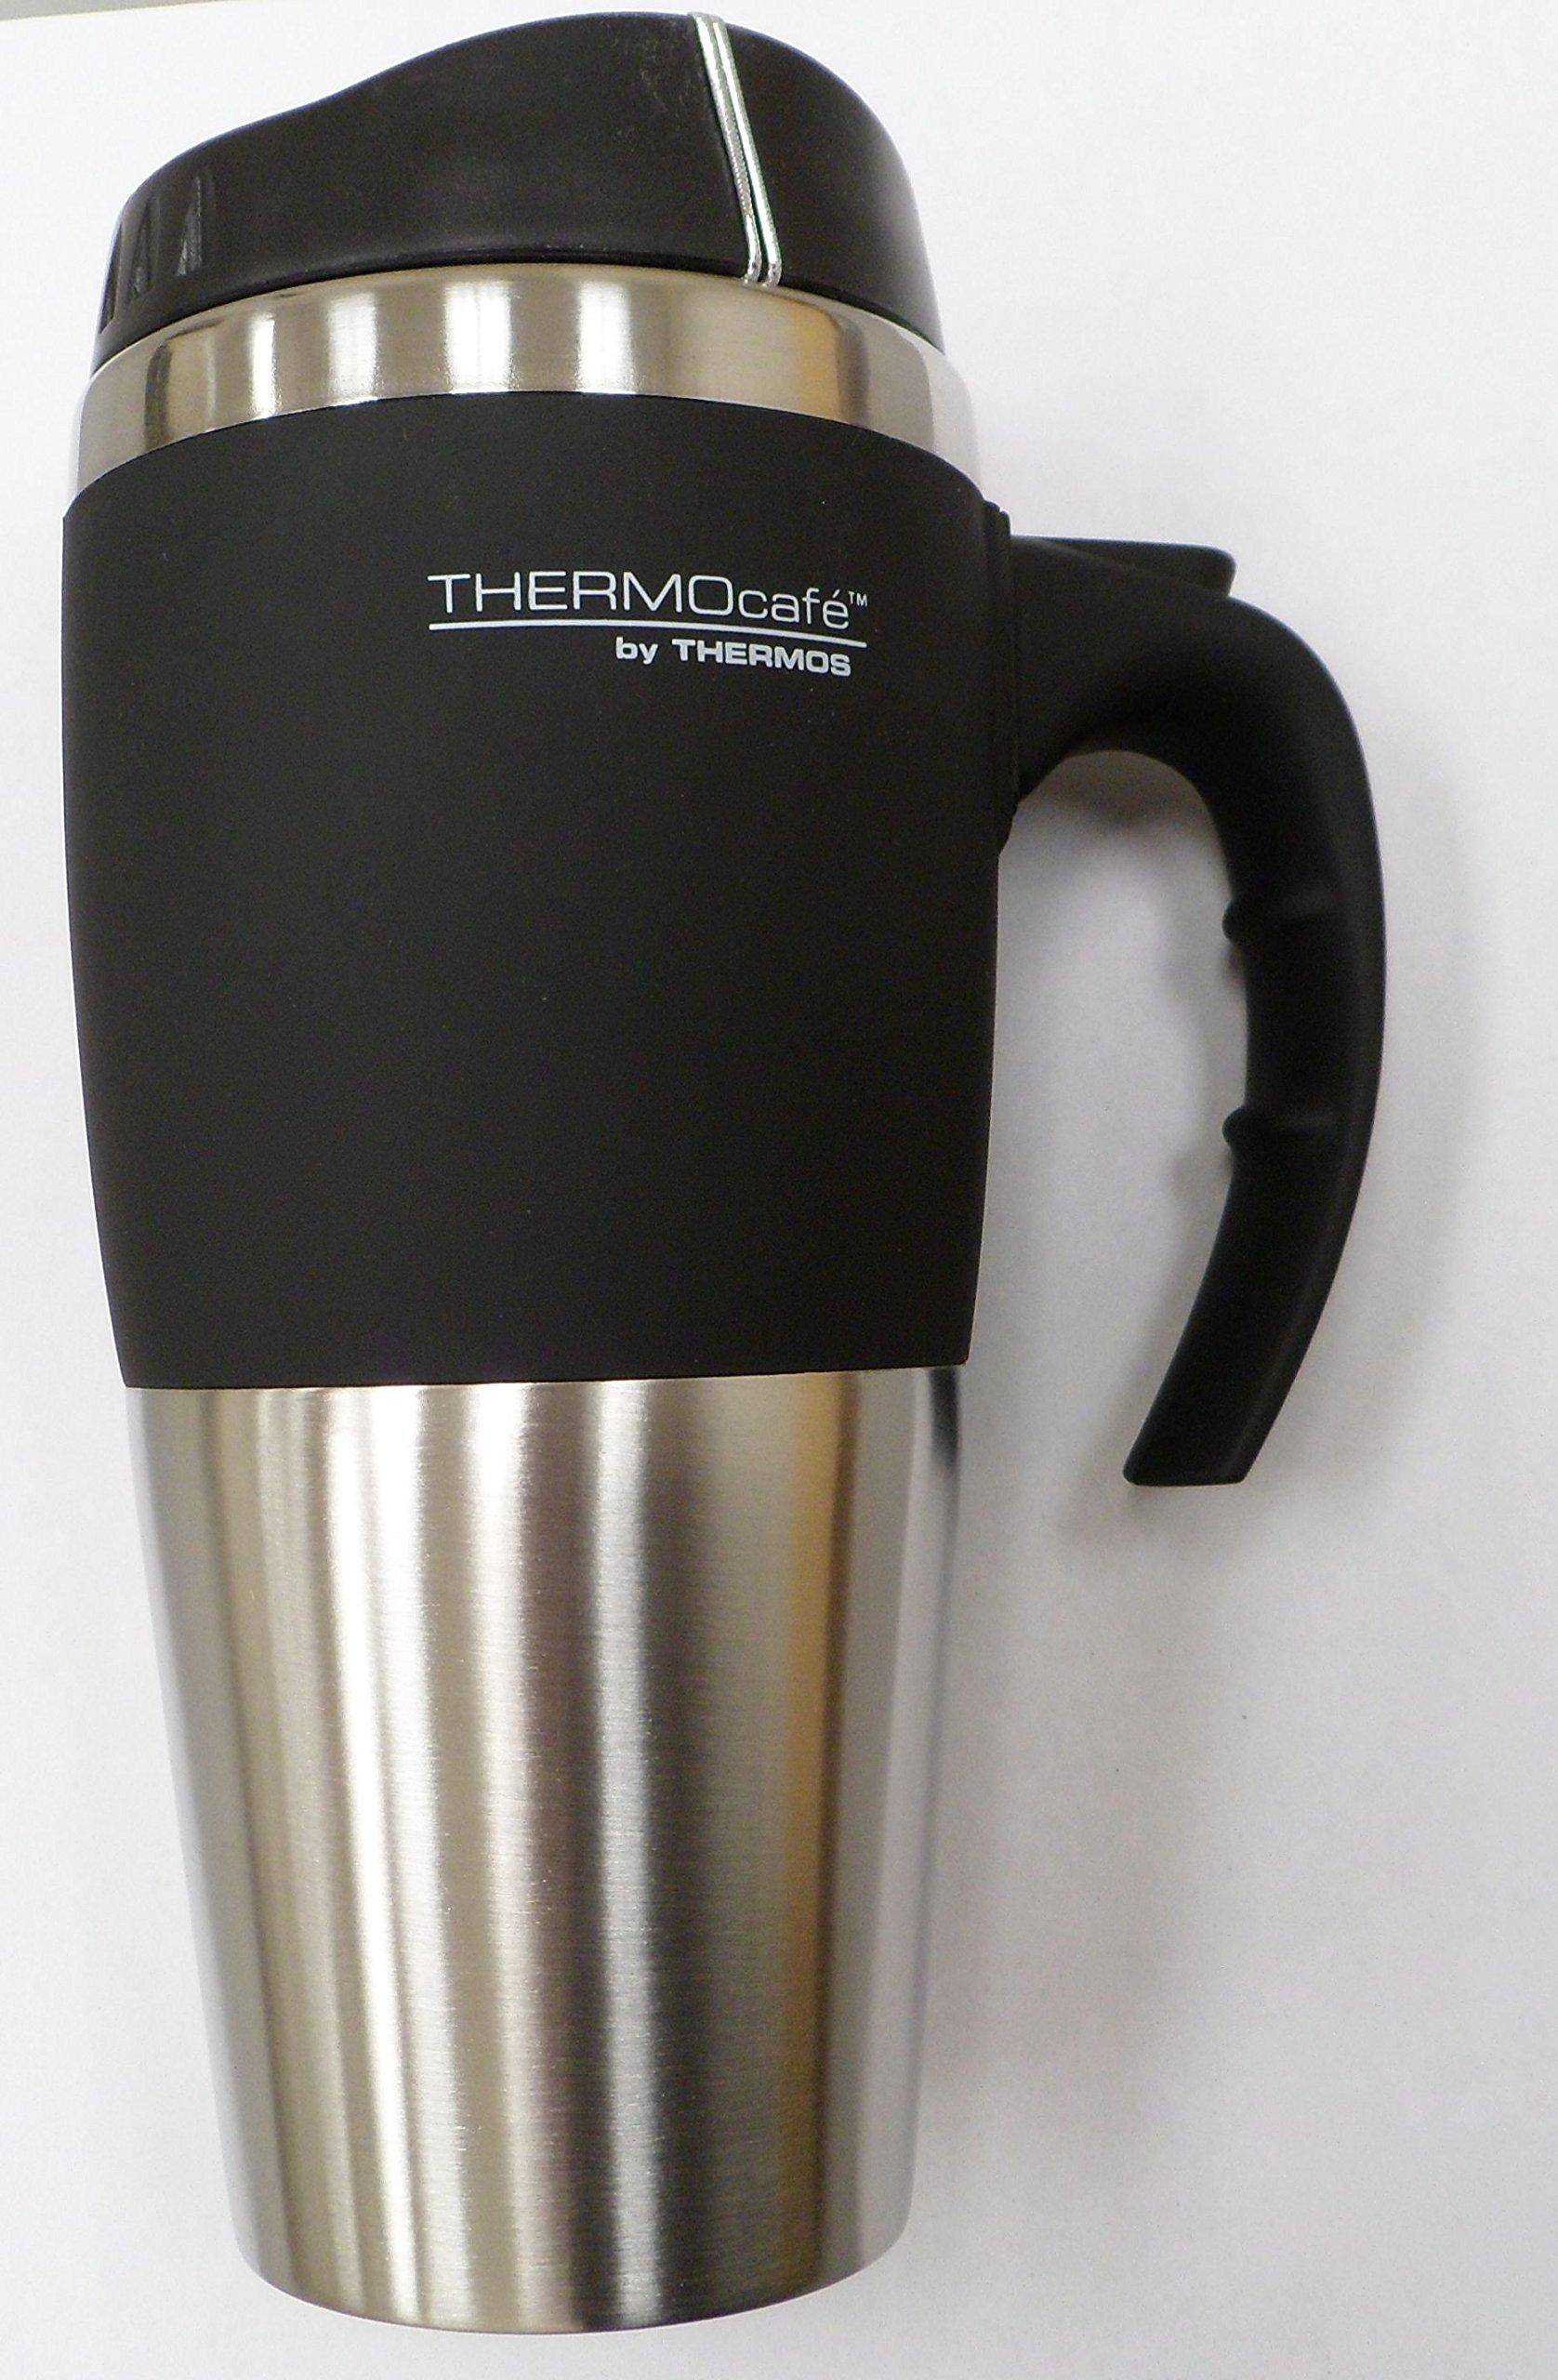 16 oz insulated stainless steel travel mug thermocafe by - Travel mug stainless steel interior ...